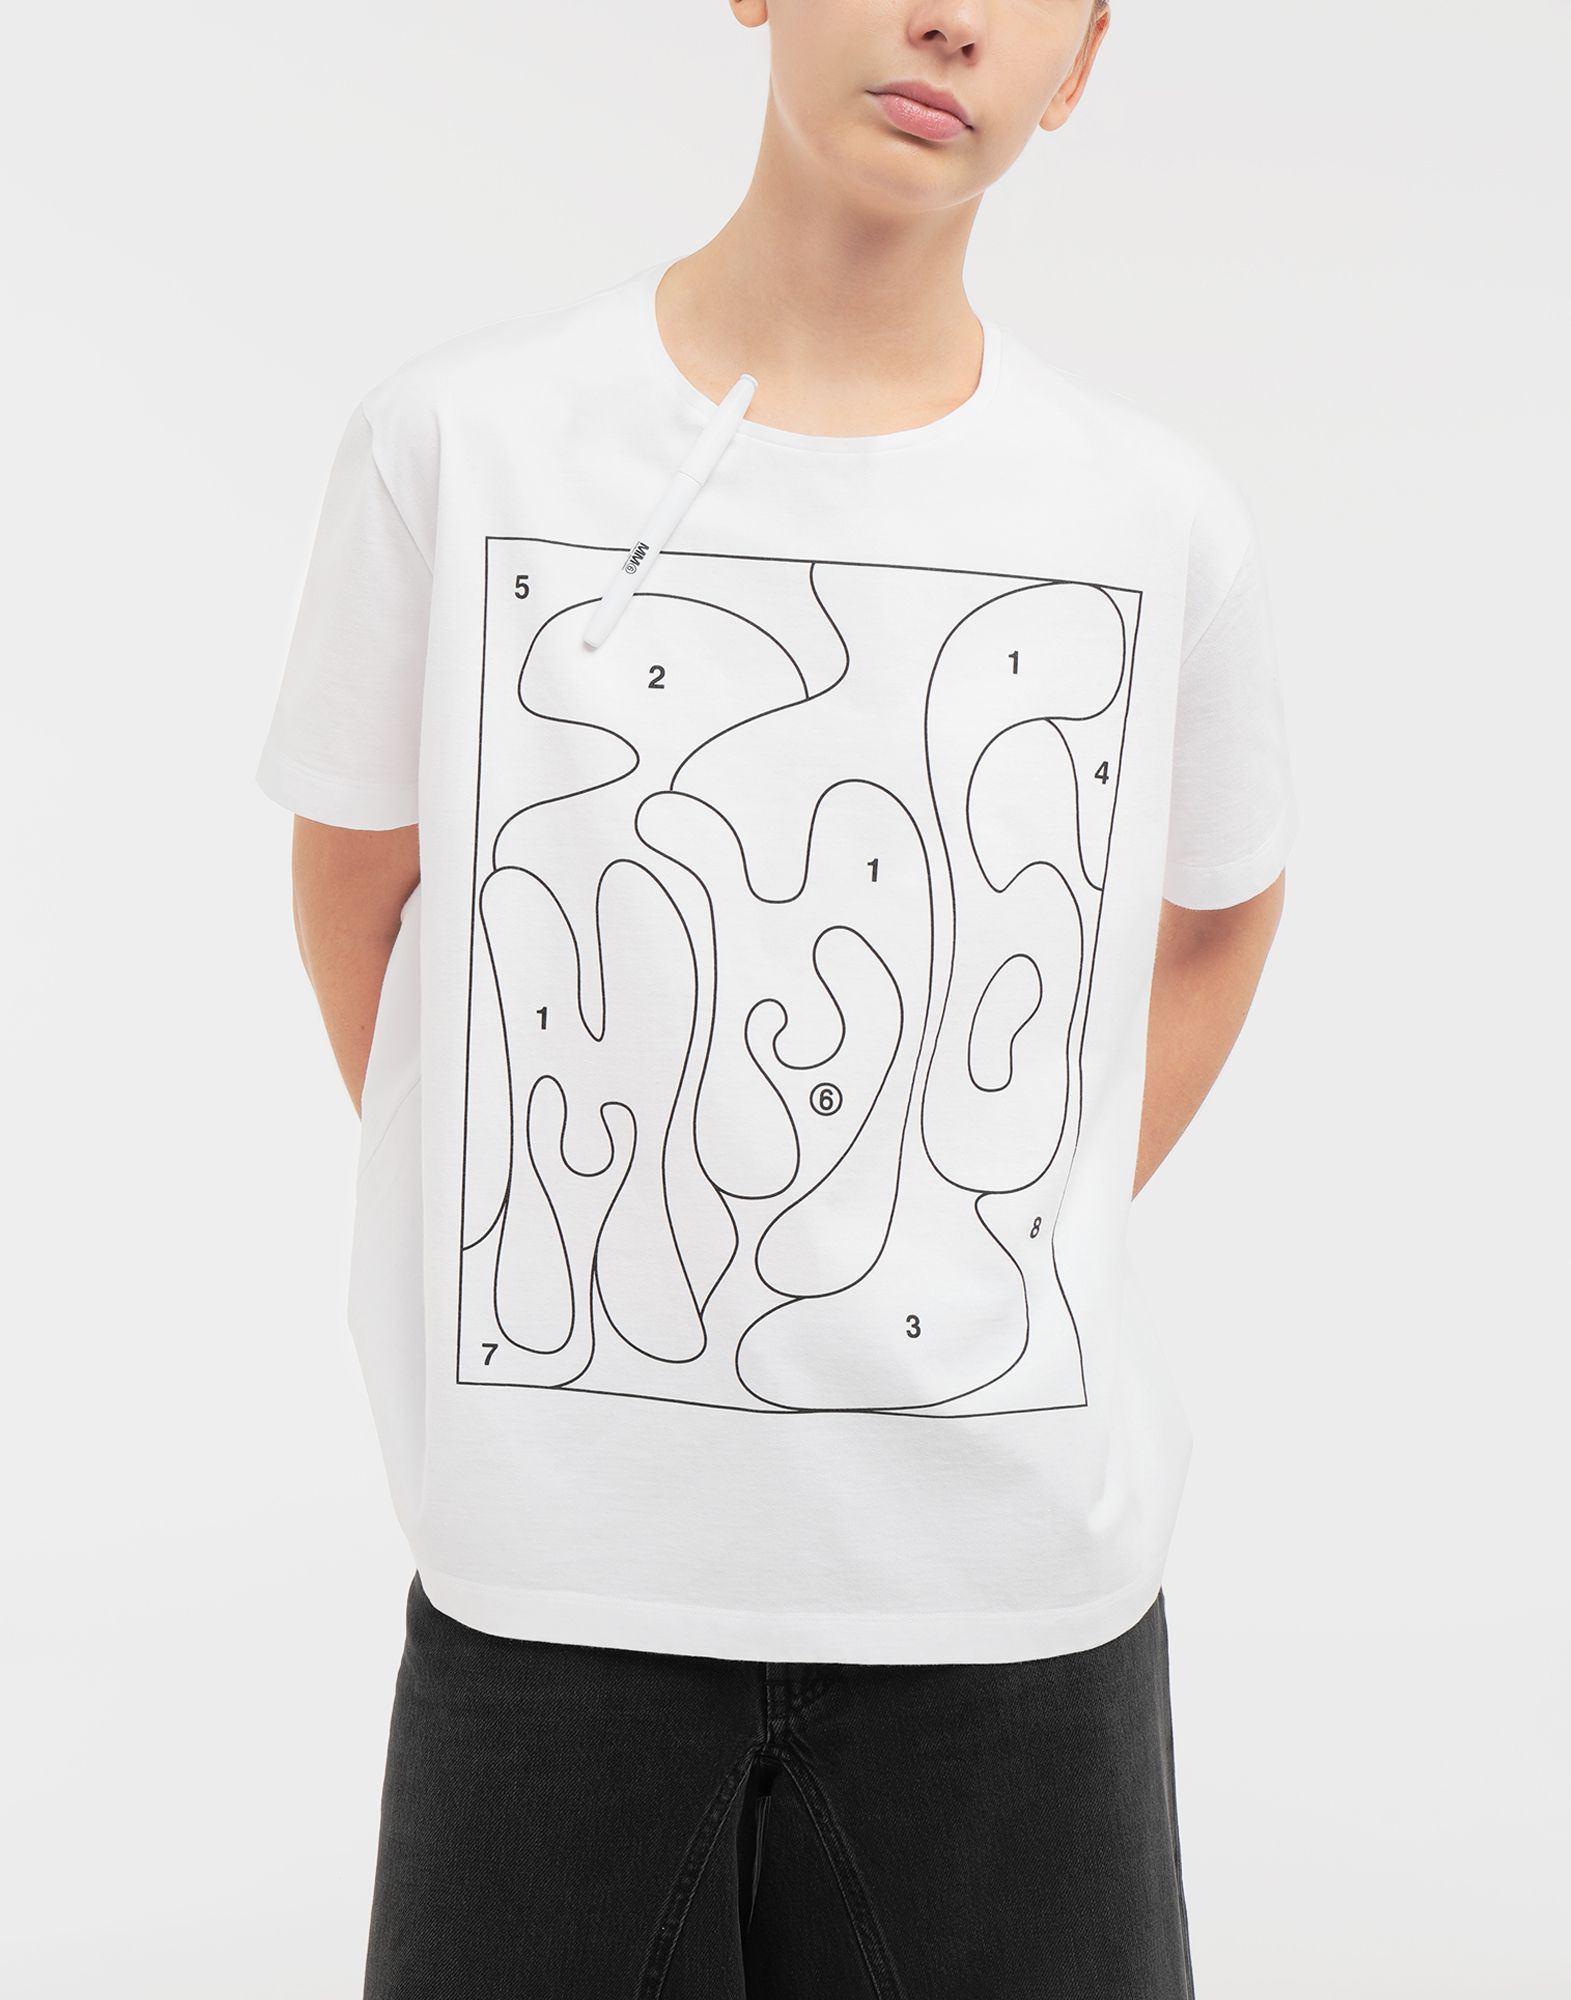 MM6 MAISON MARGIELA Colouring book print T-shirt Short sleeve t-shirt Woman r